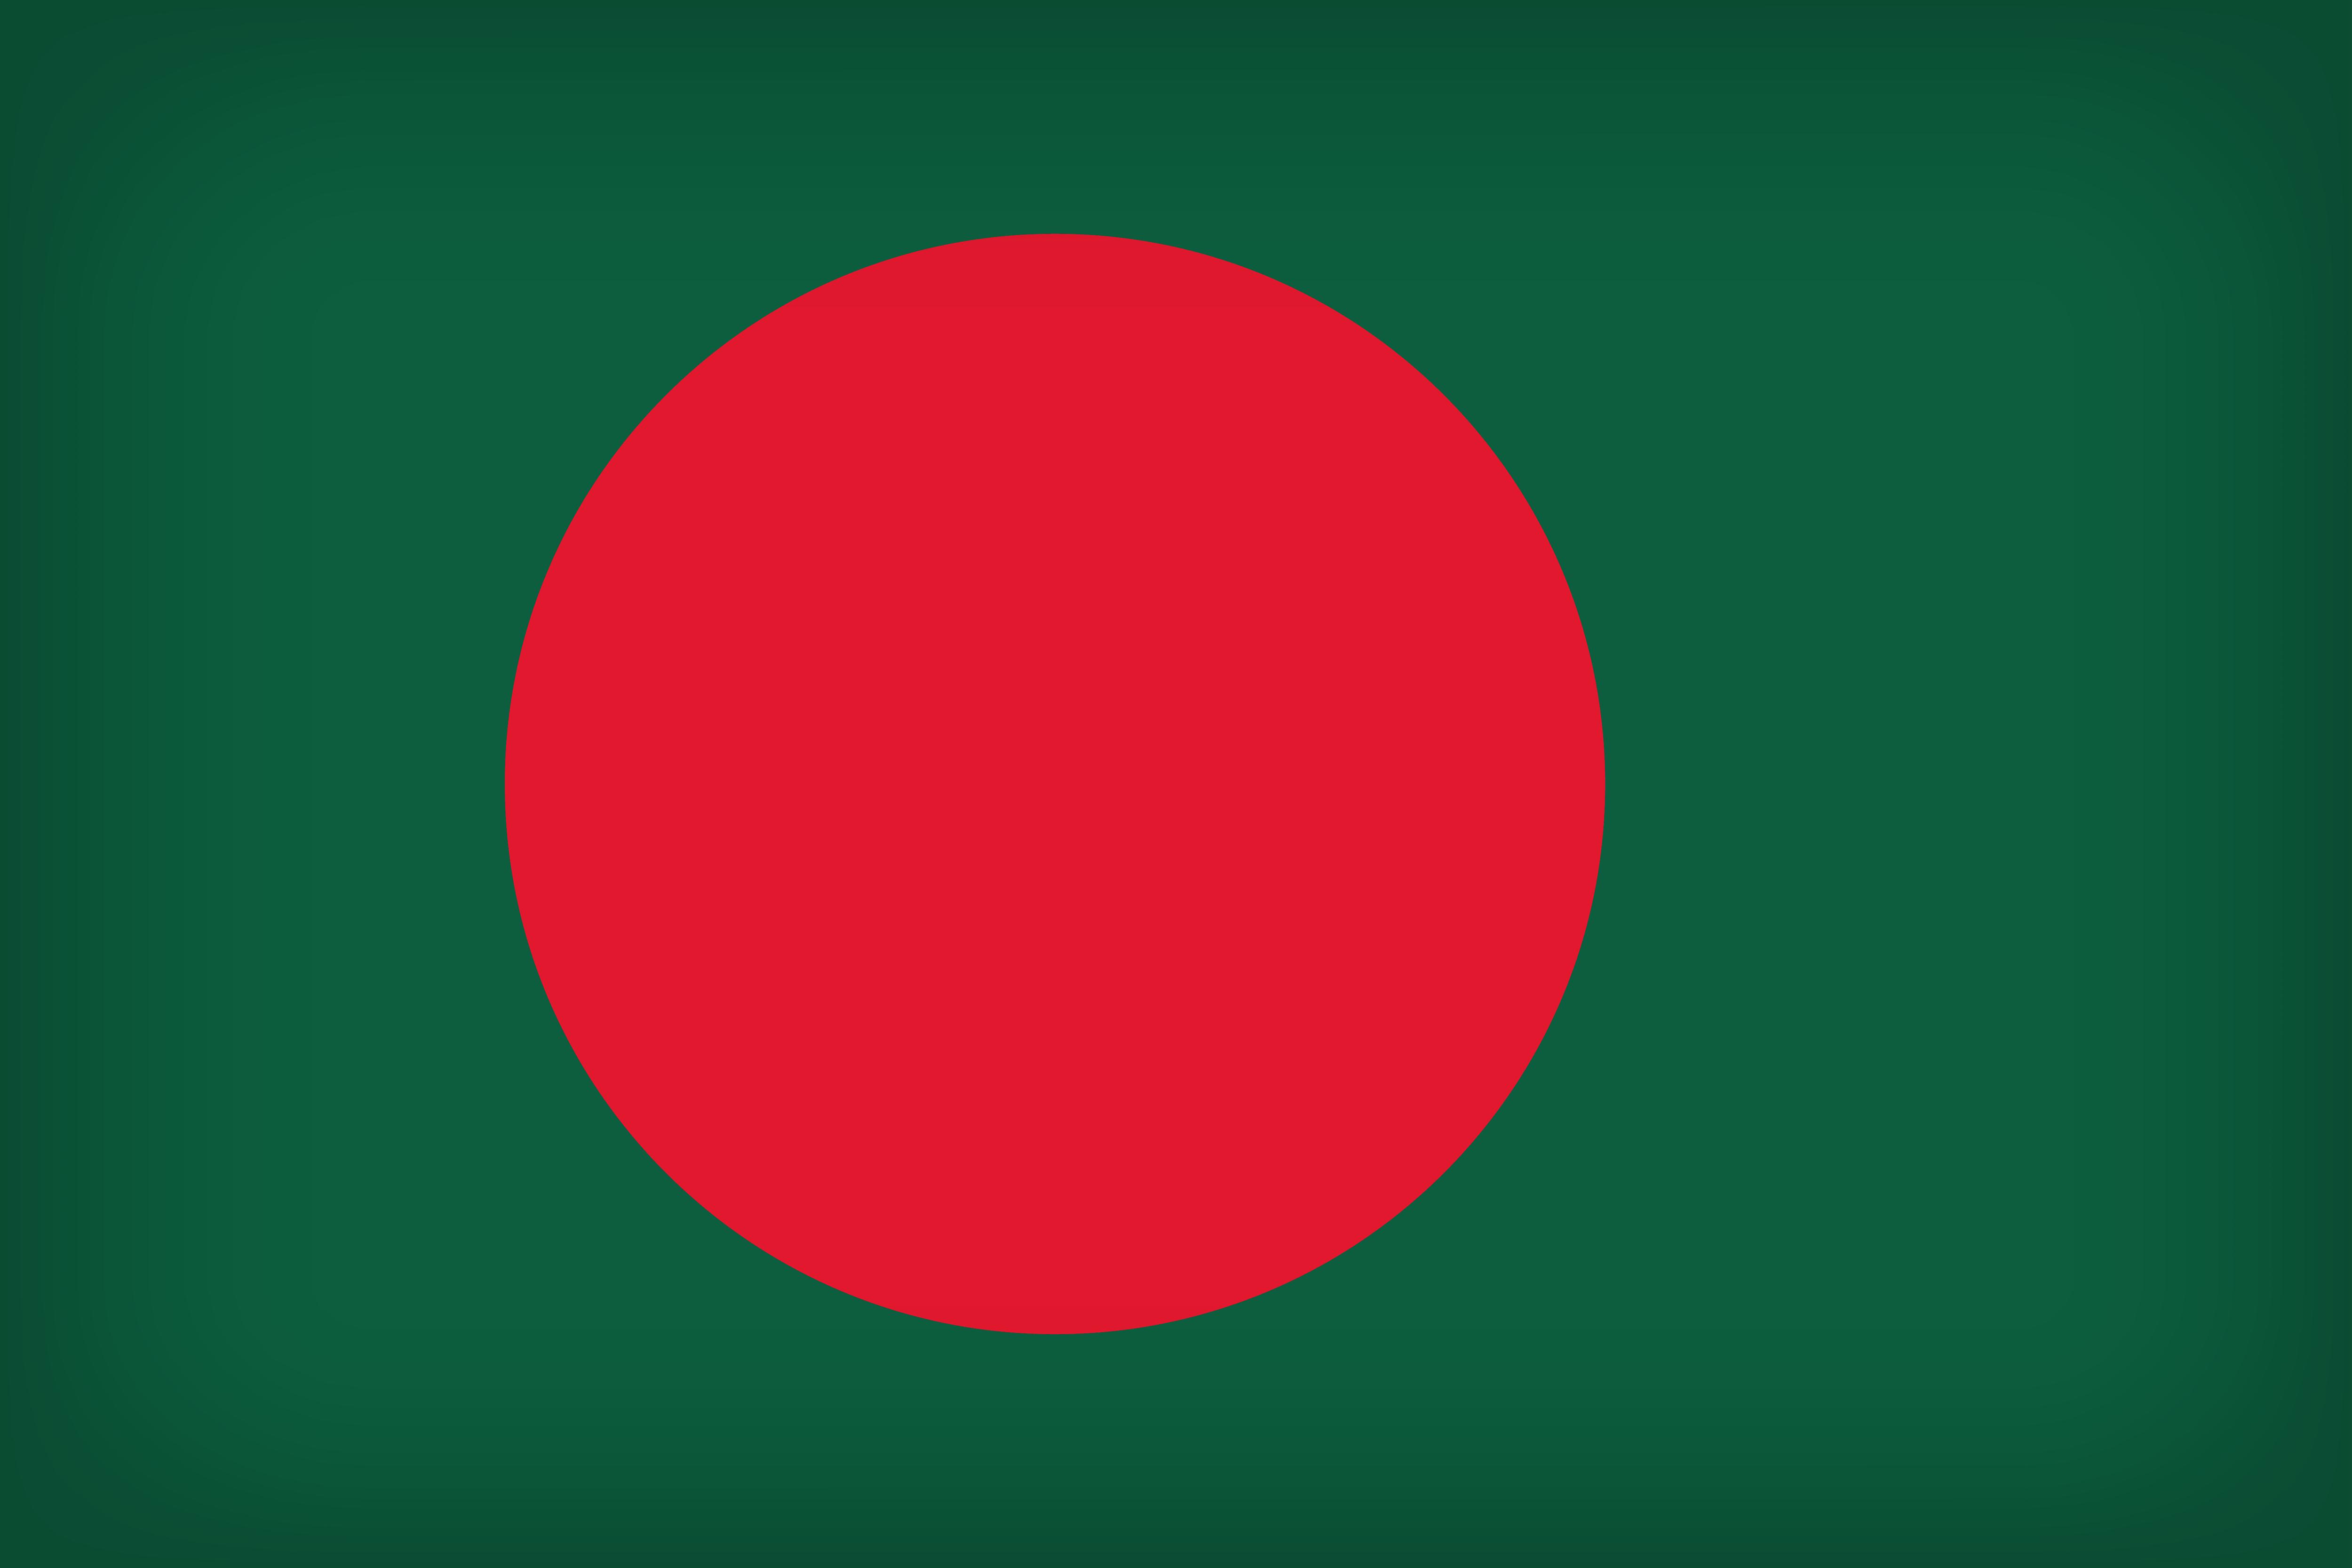 Bangladesh Large Flag.